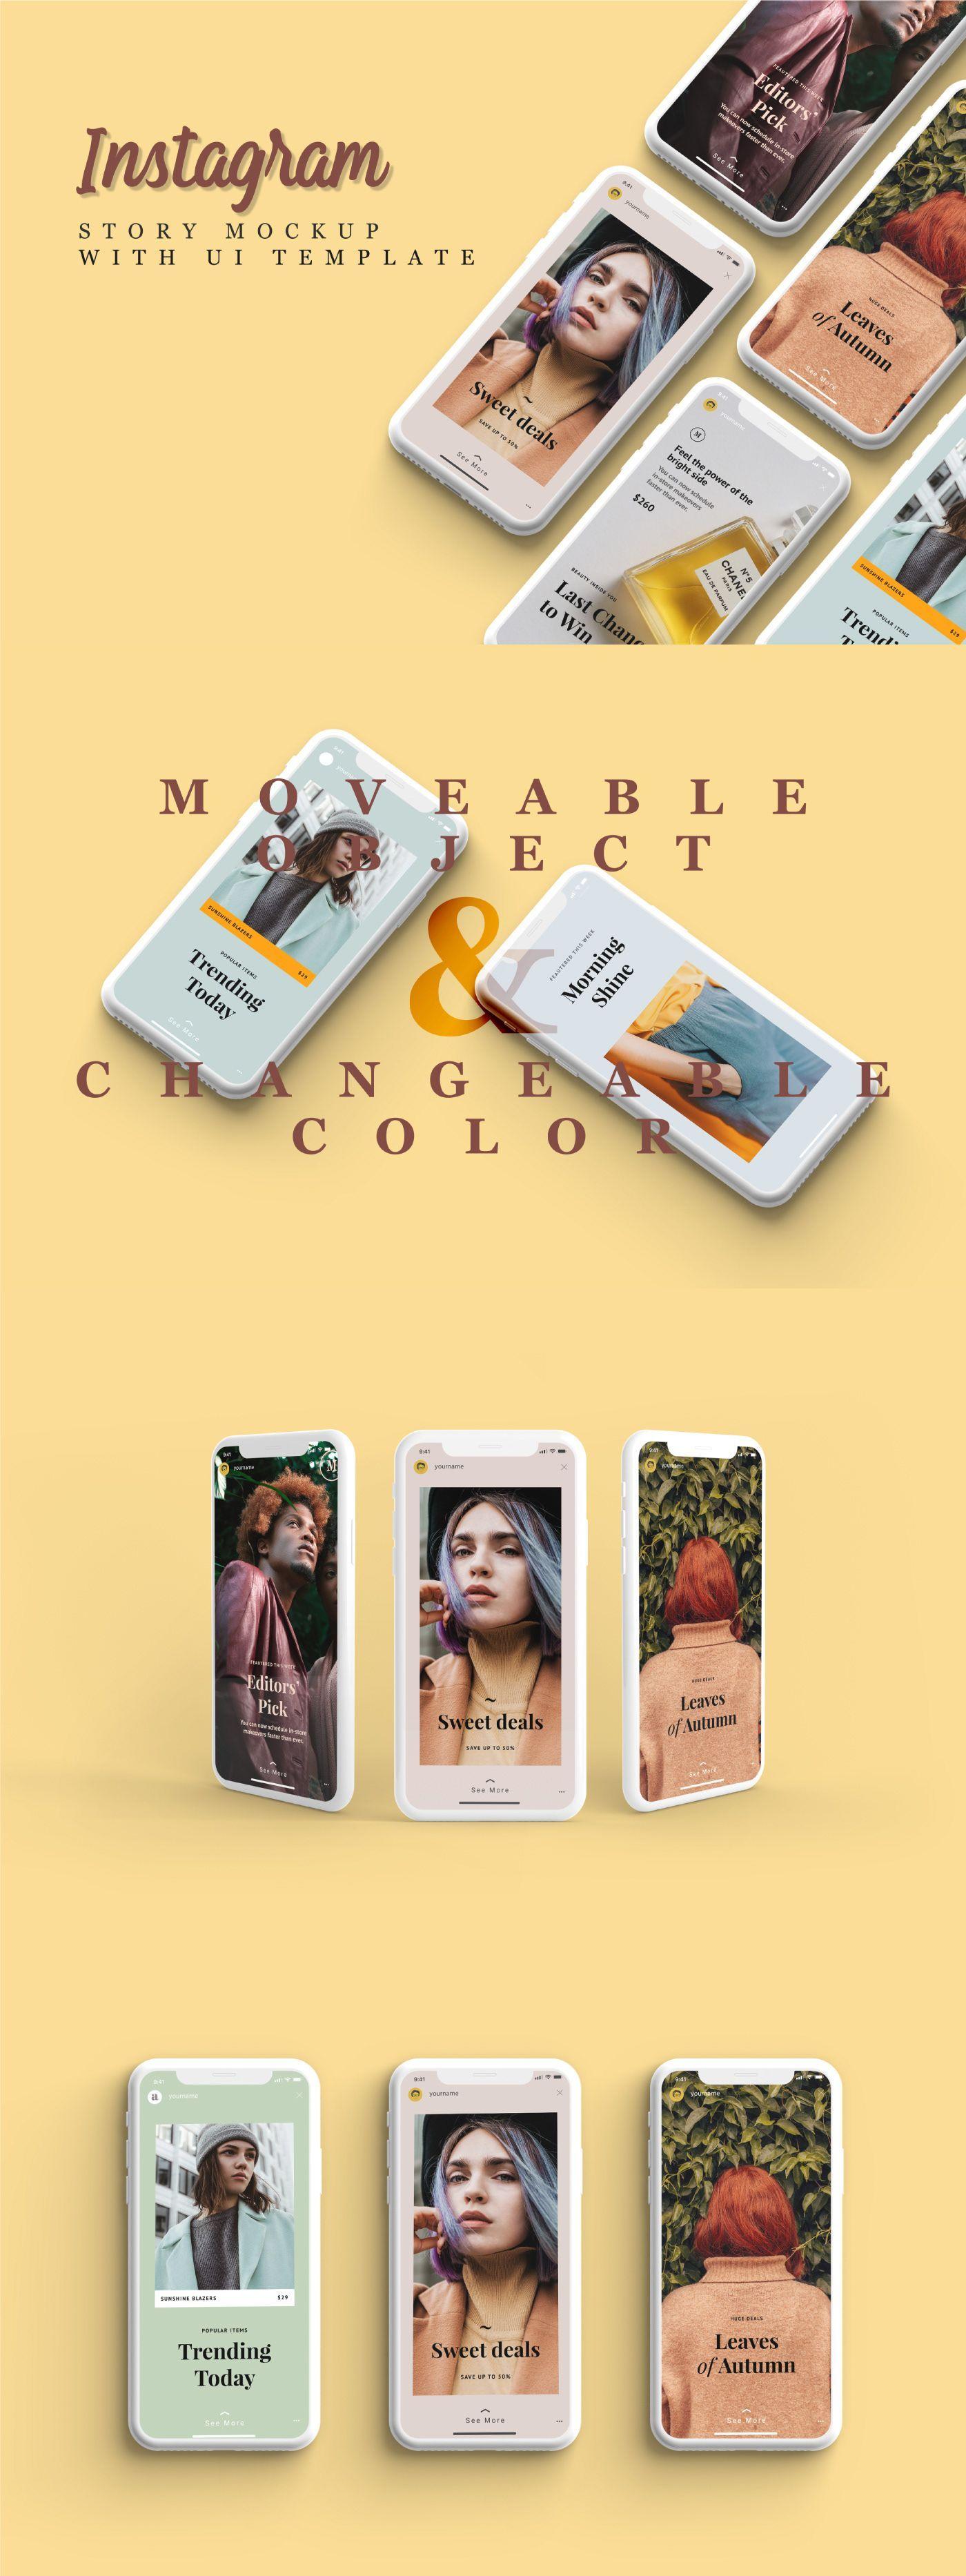 Free Instagram Story Mockup Iphone X On Behance Webdesigniphonex Web Design Websites Web Design Tips Free Instagram